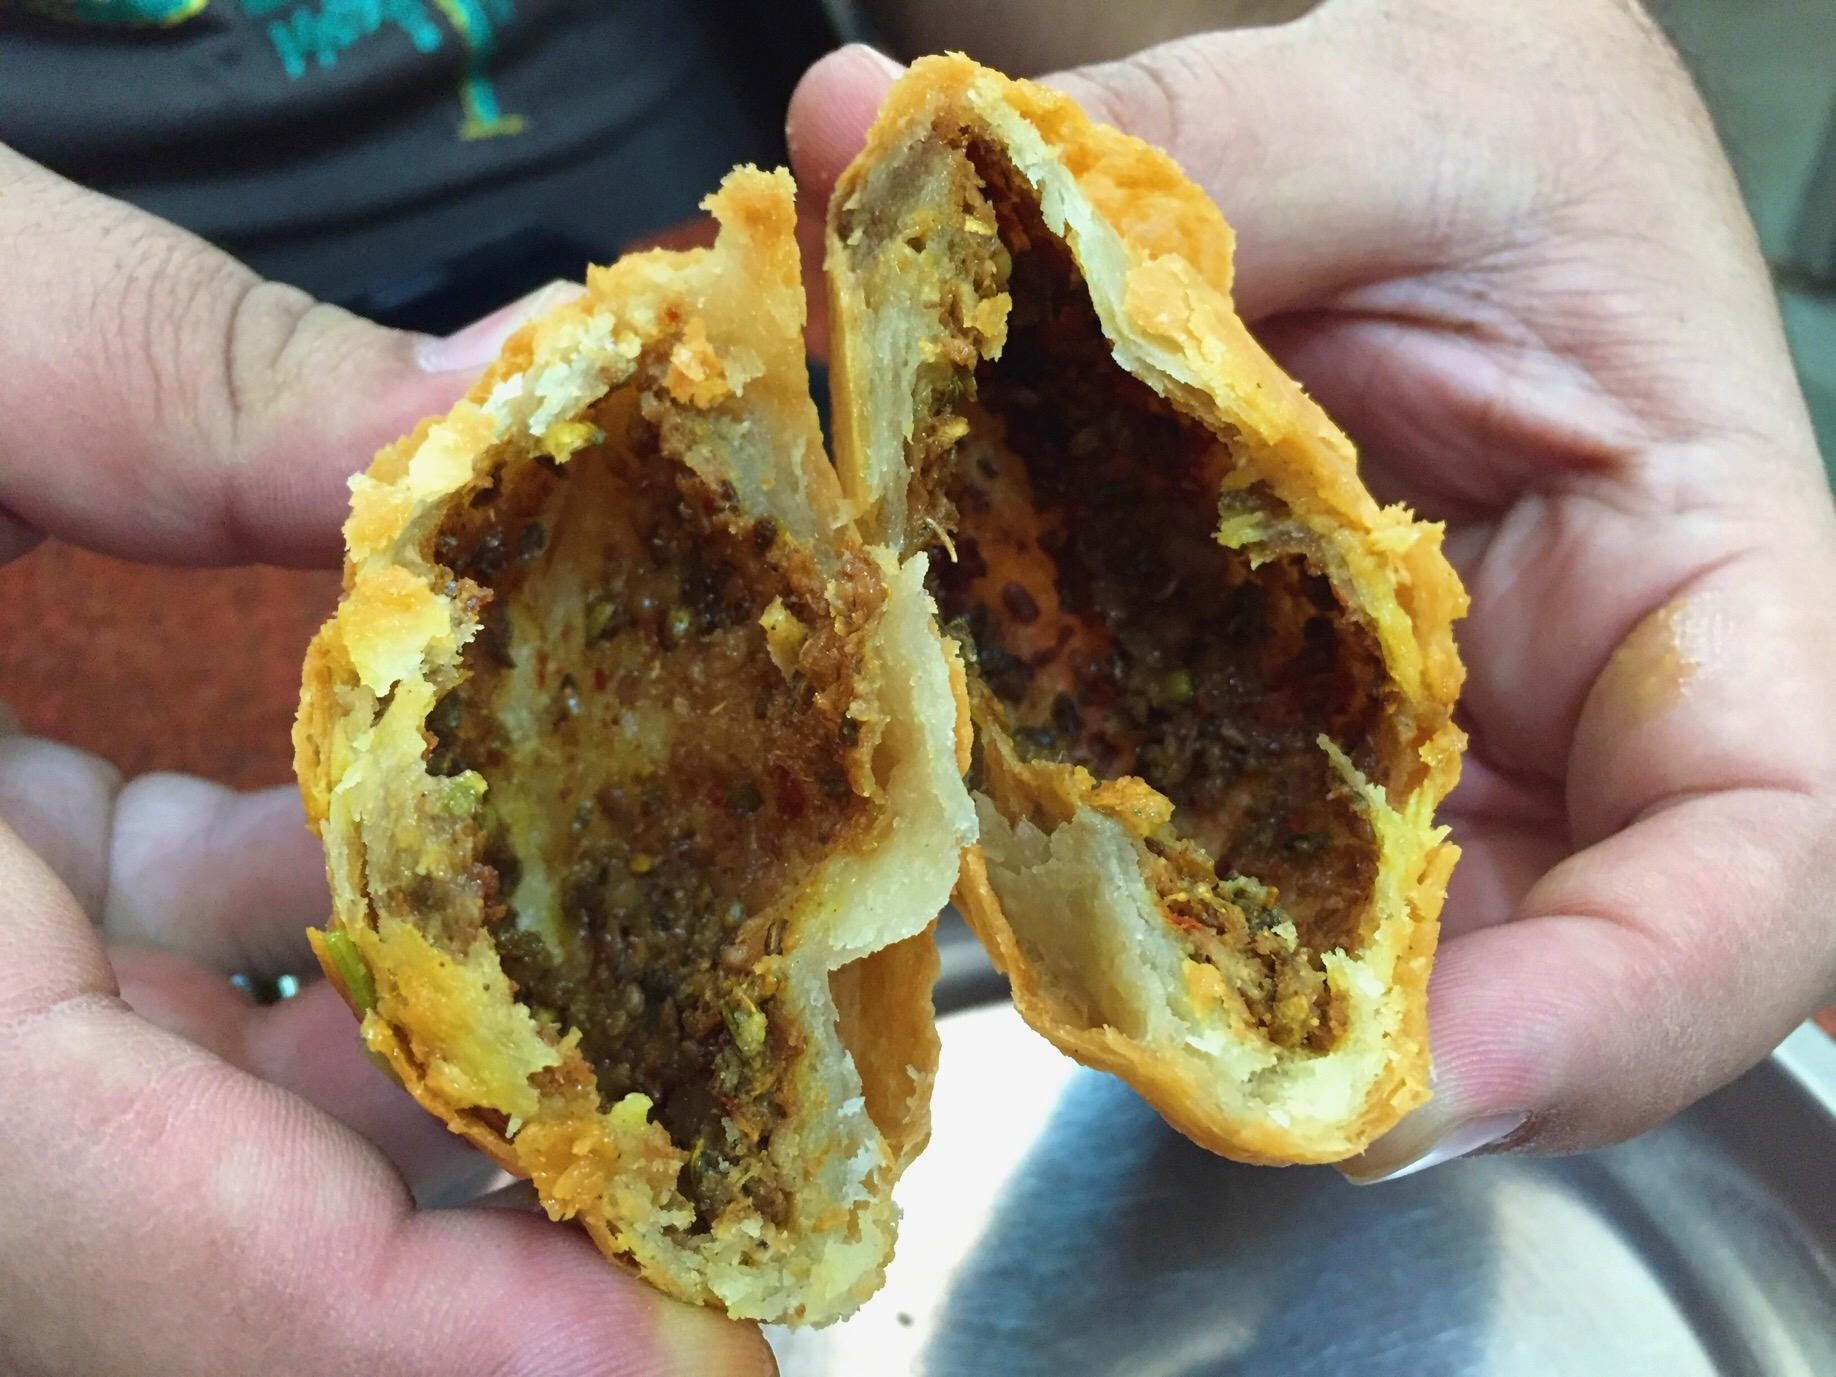 Kachori for breakfast in Delhi's Chandni Chowk market